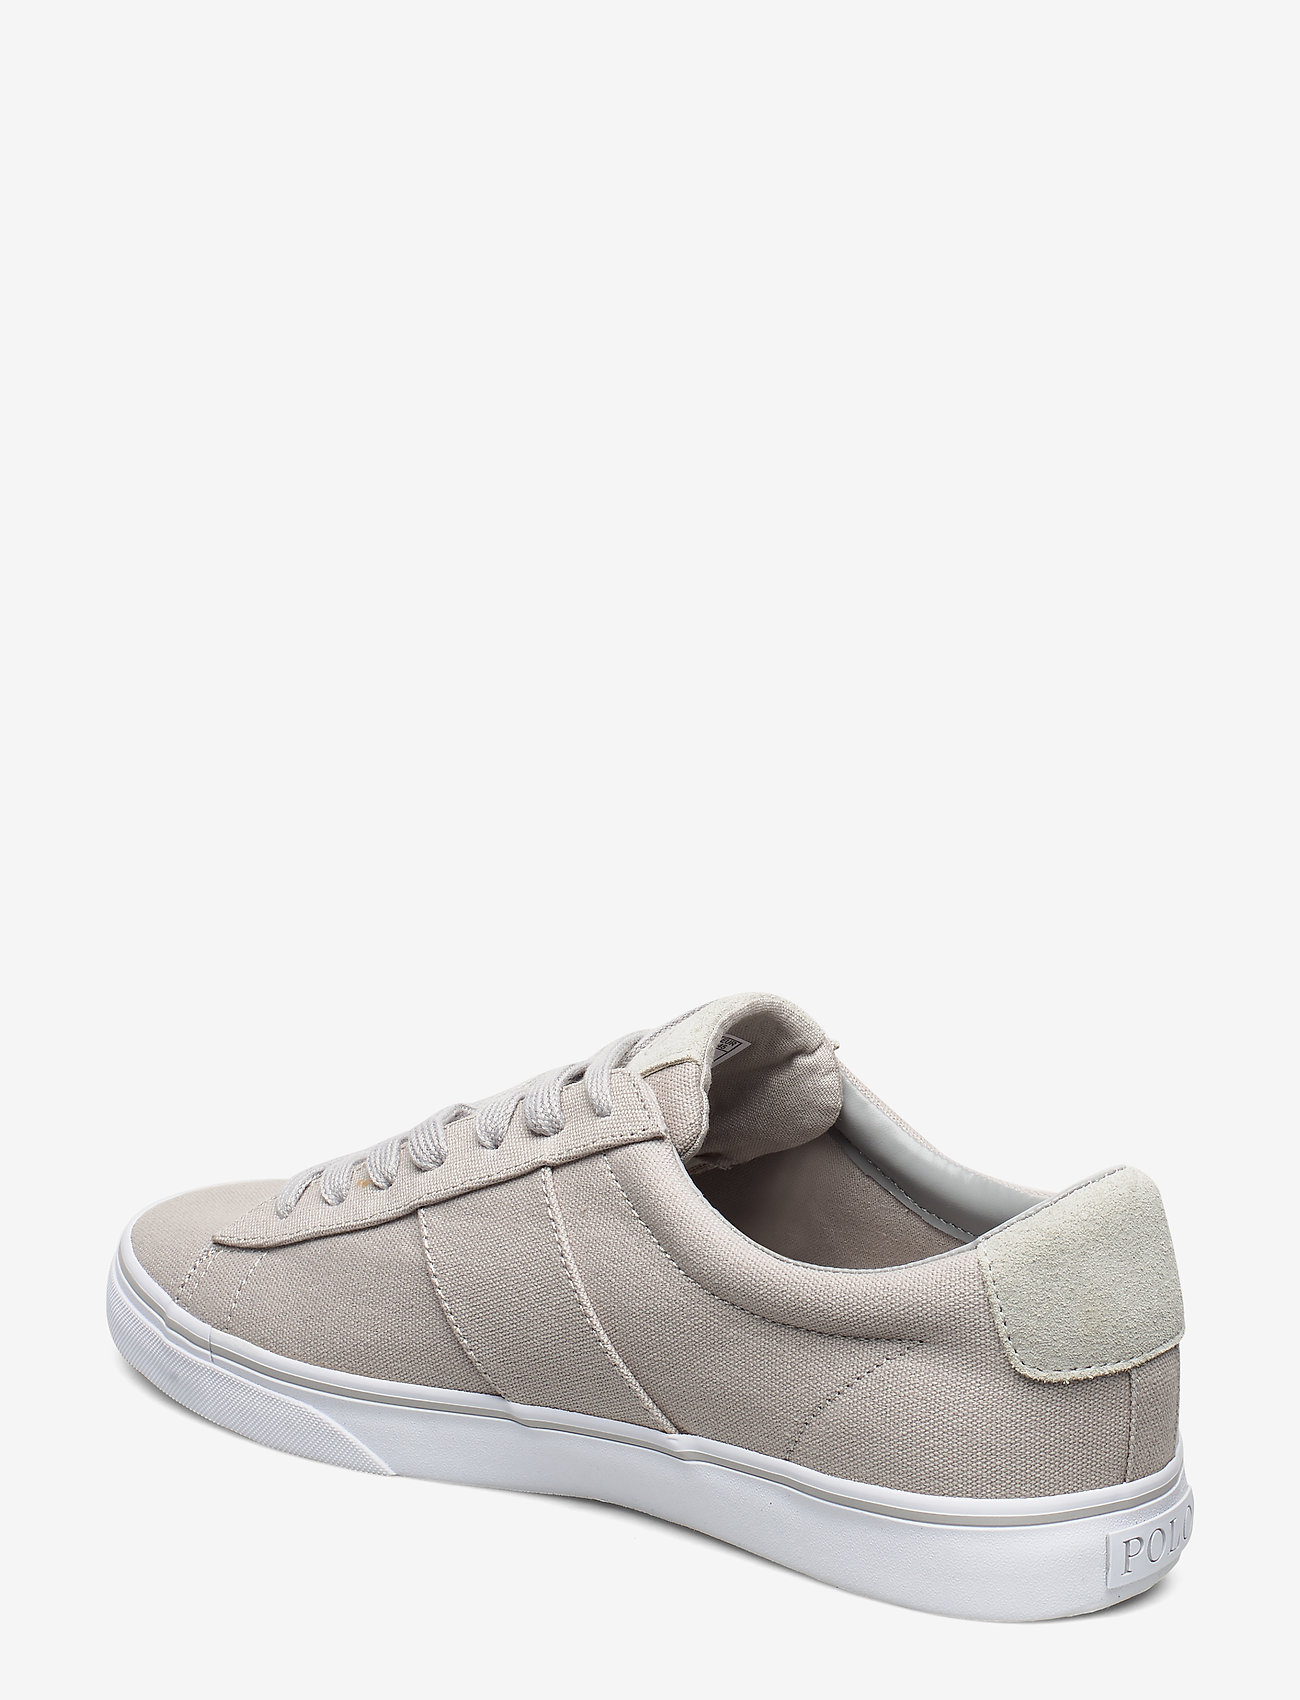 Polo Ralph Lauren Sayer Canvas Sneaker - Sneakers SOFT GREY - Schuhe Billige